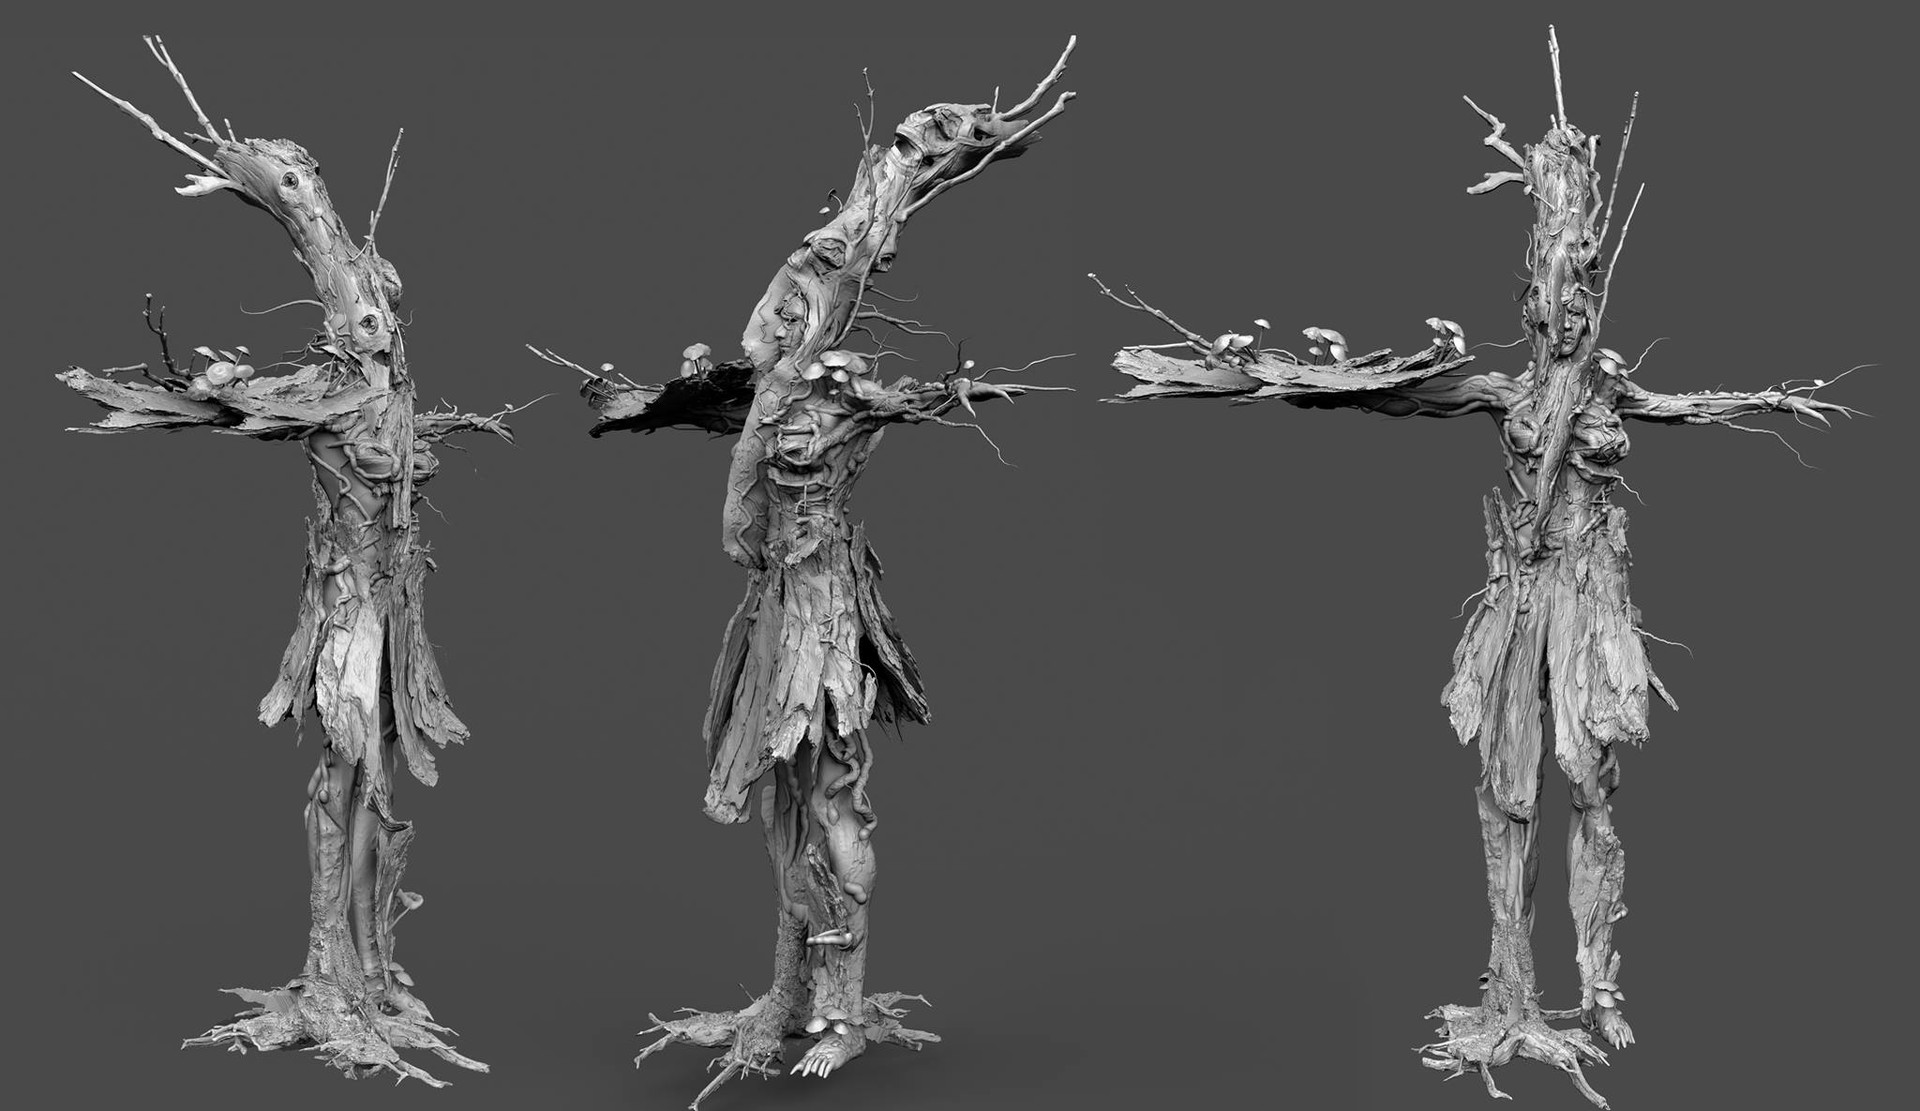 david-lesperance-treenymph.jpg